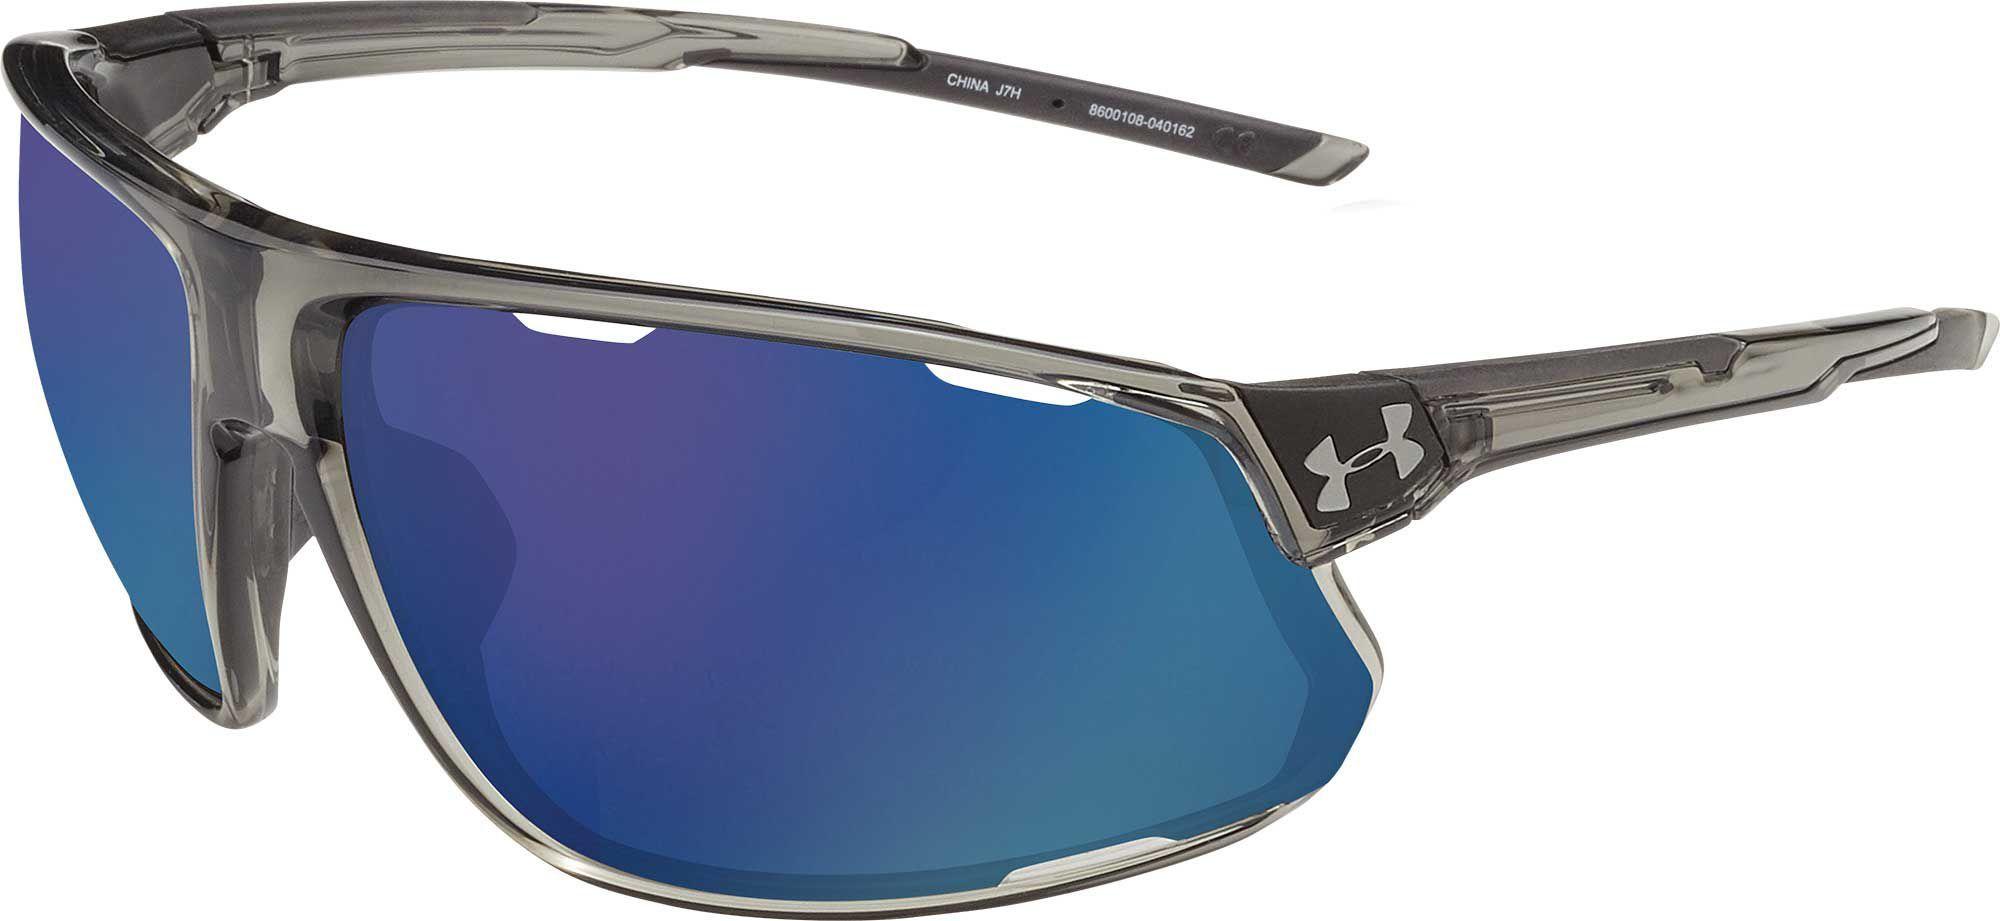 Under Armour Adult Strive Baseball Sunglasses, Gloss